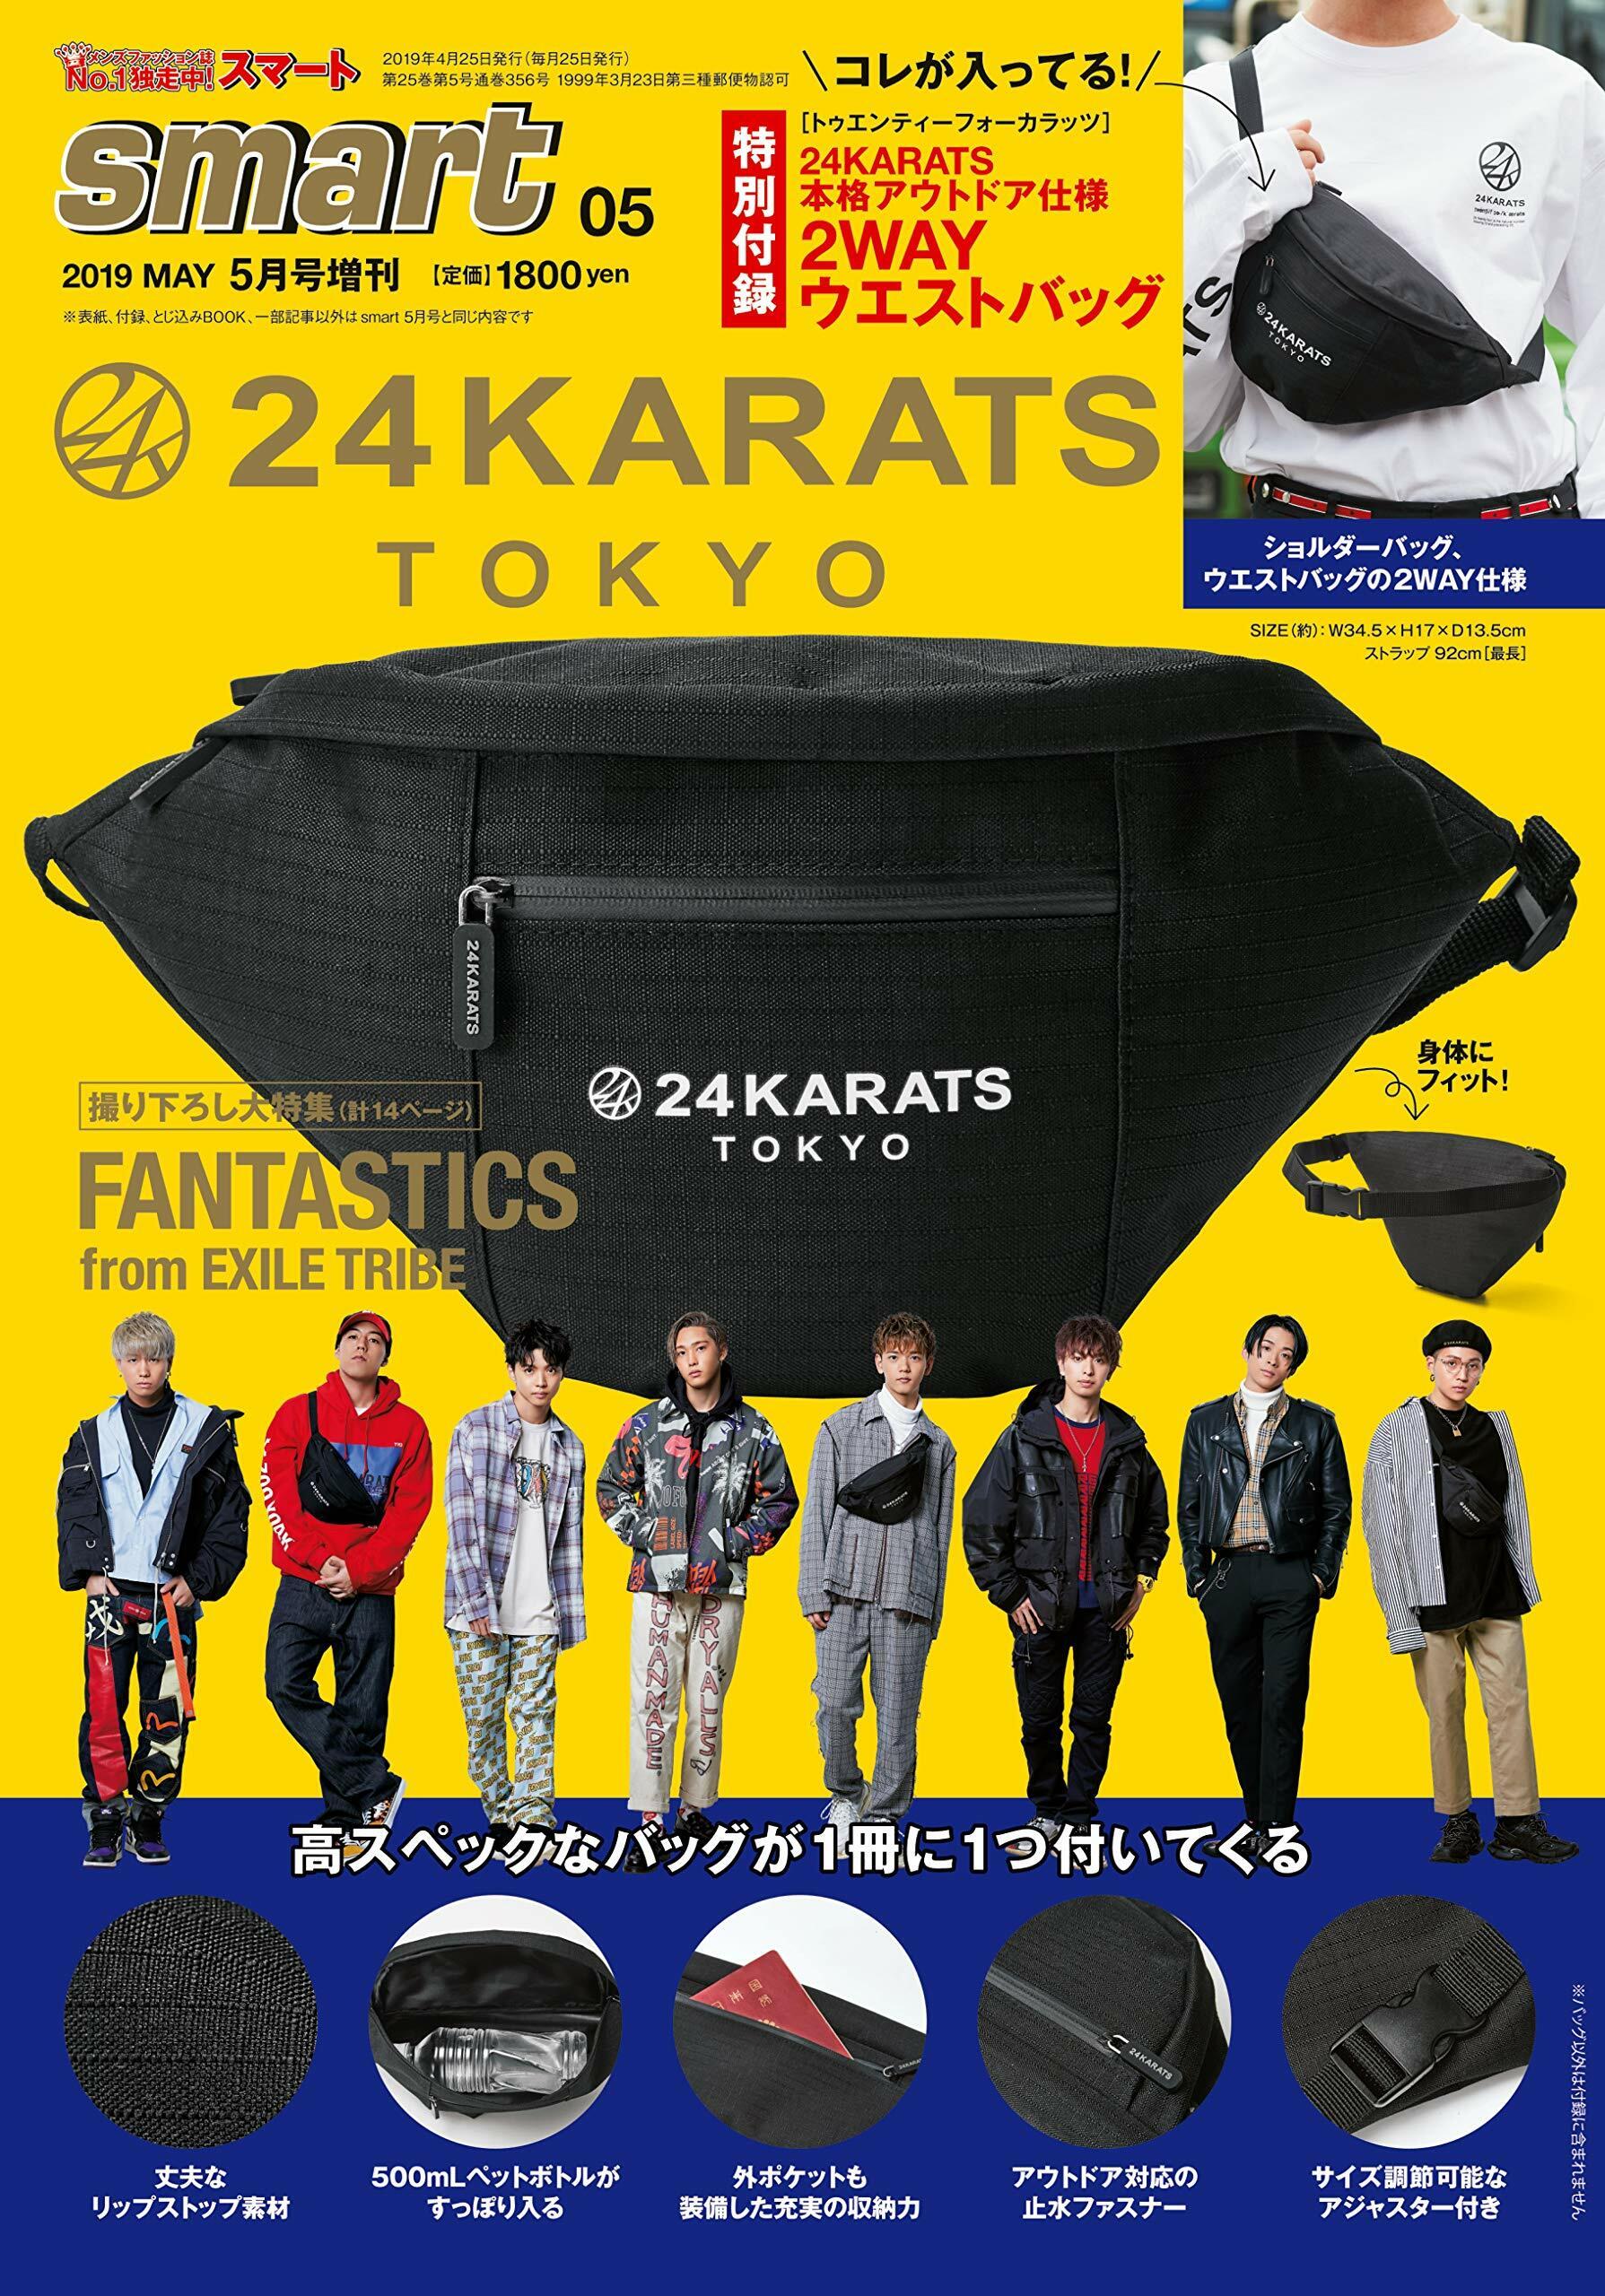 smart (スマ-ト) 2019年 05月 增刊號 (雜誌, 月刊)